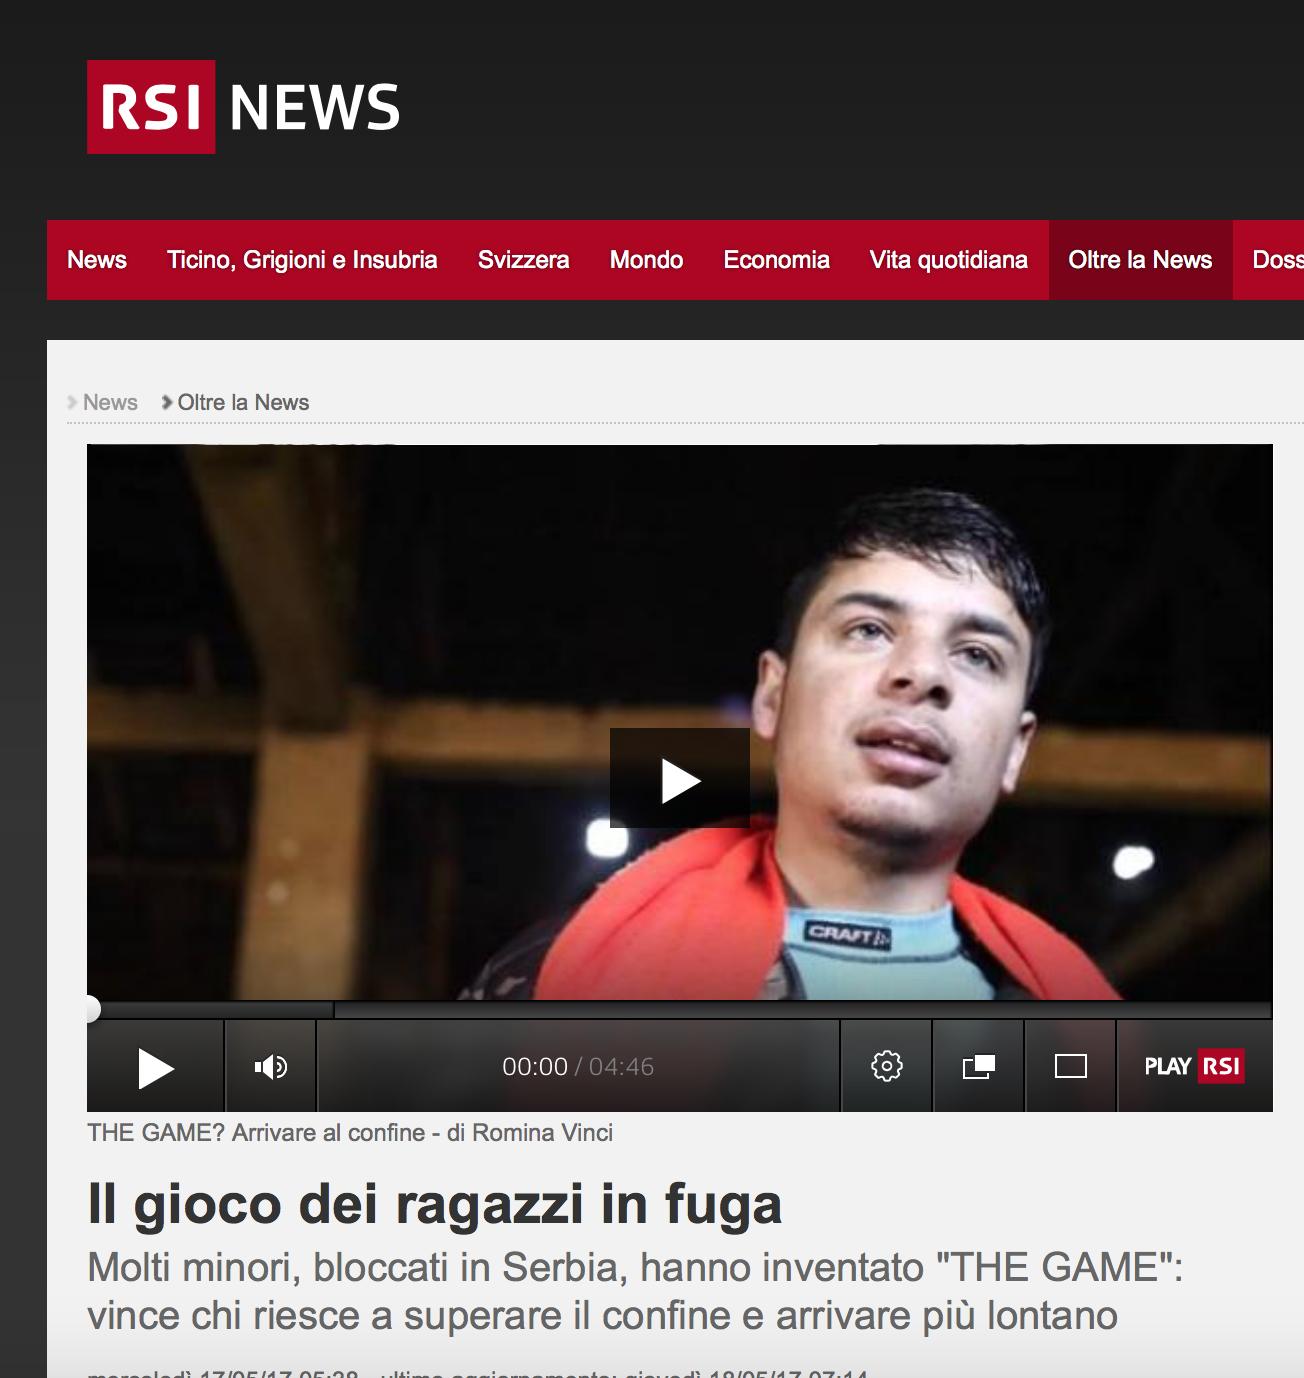 RSI - Radio Televisione Svizzera - May 2017